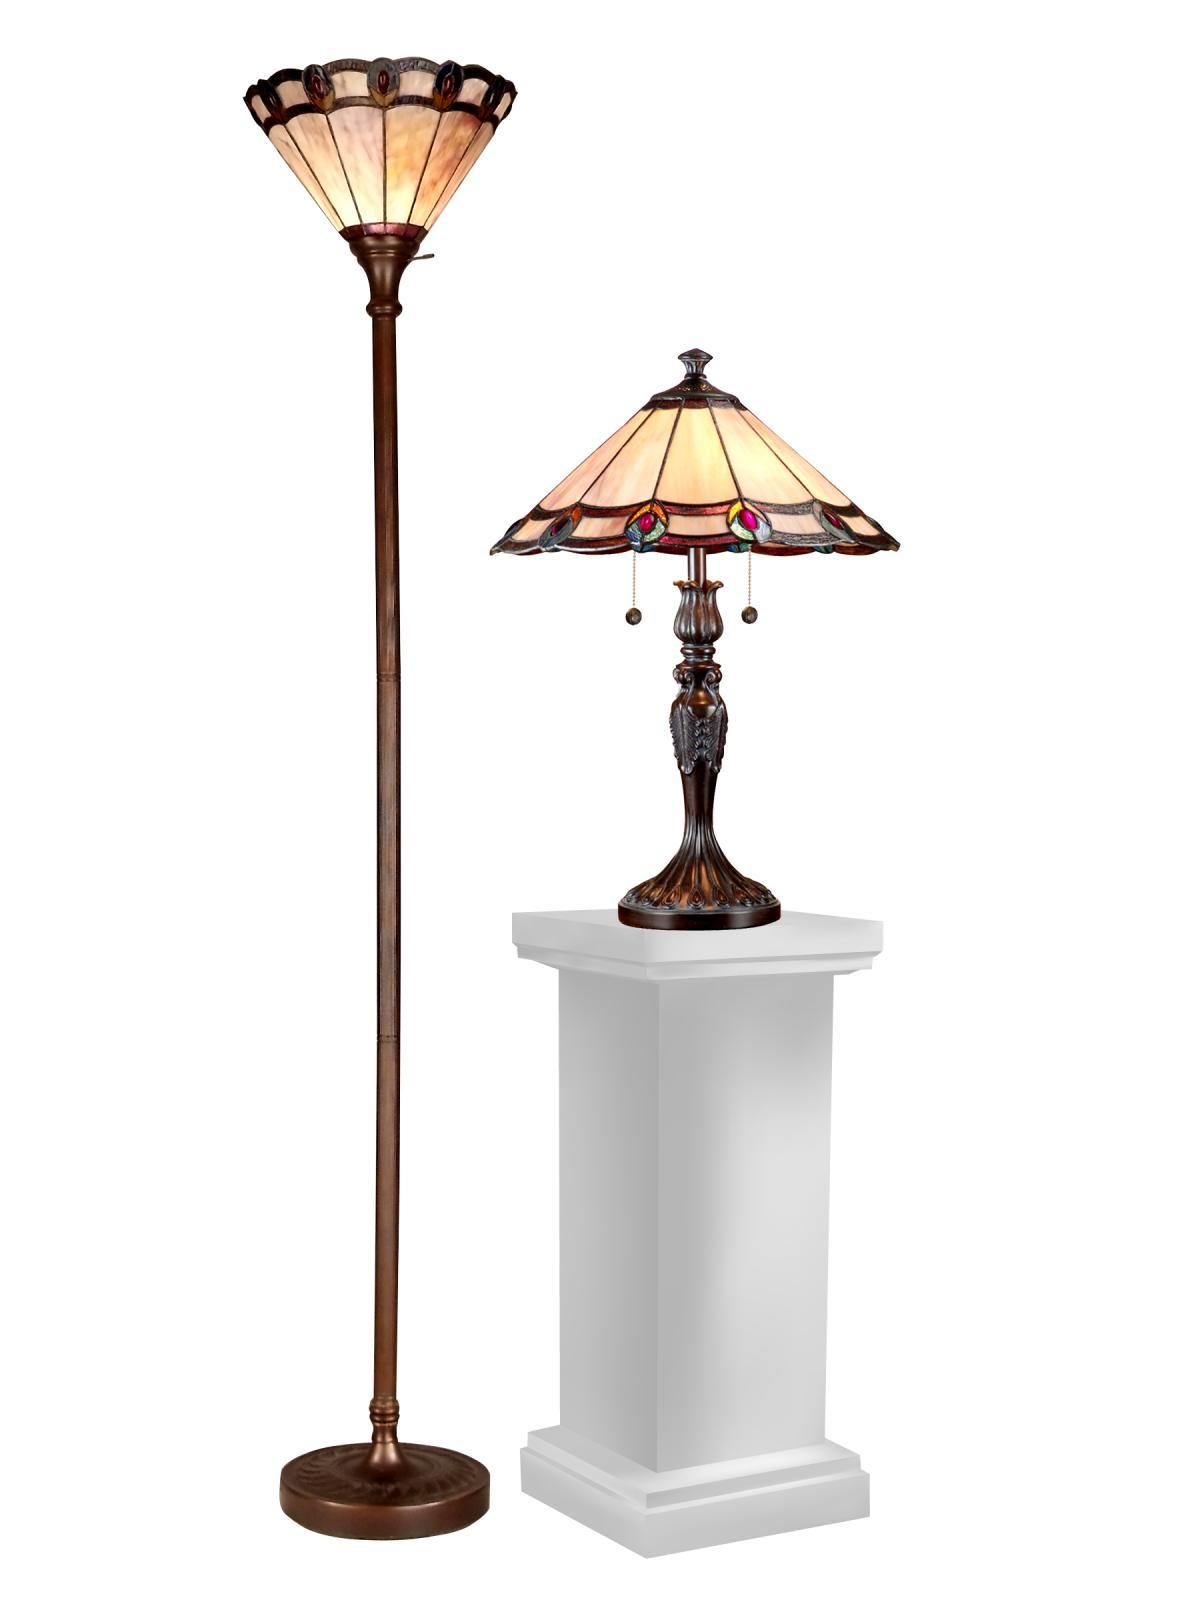 2 Dale Tiffany Peacock Table Floor Lamps Set Lighting